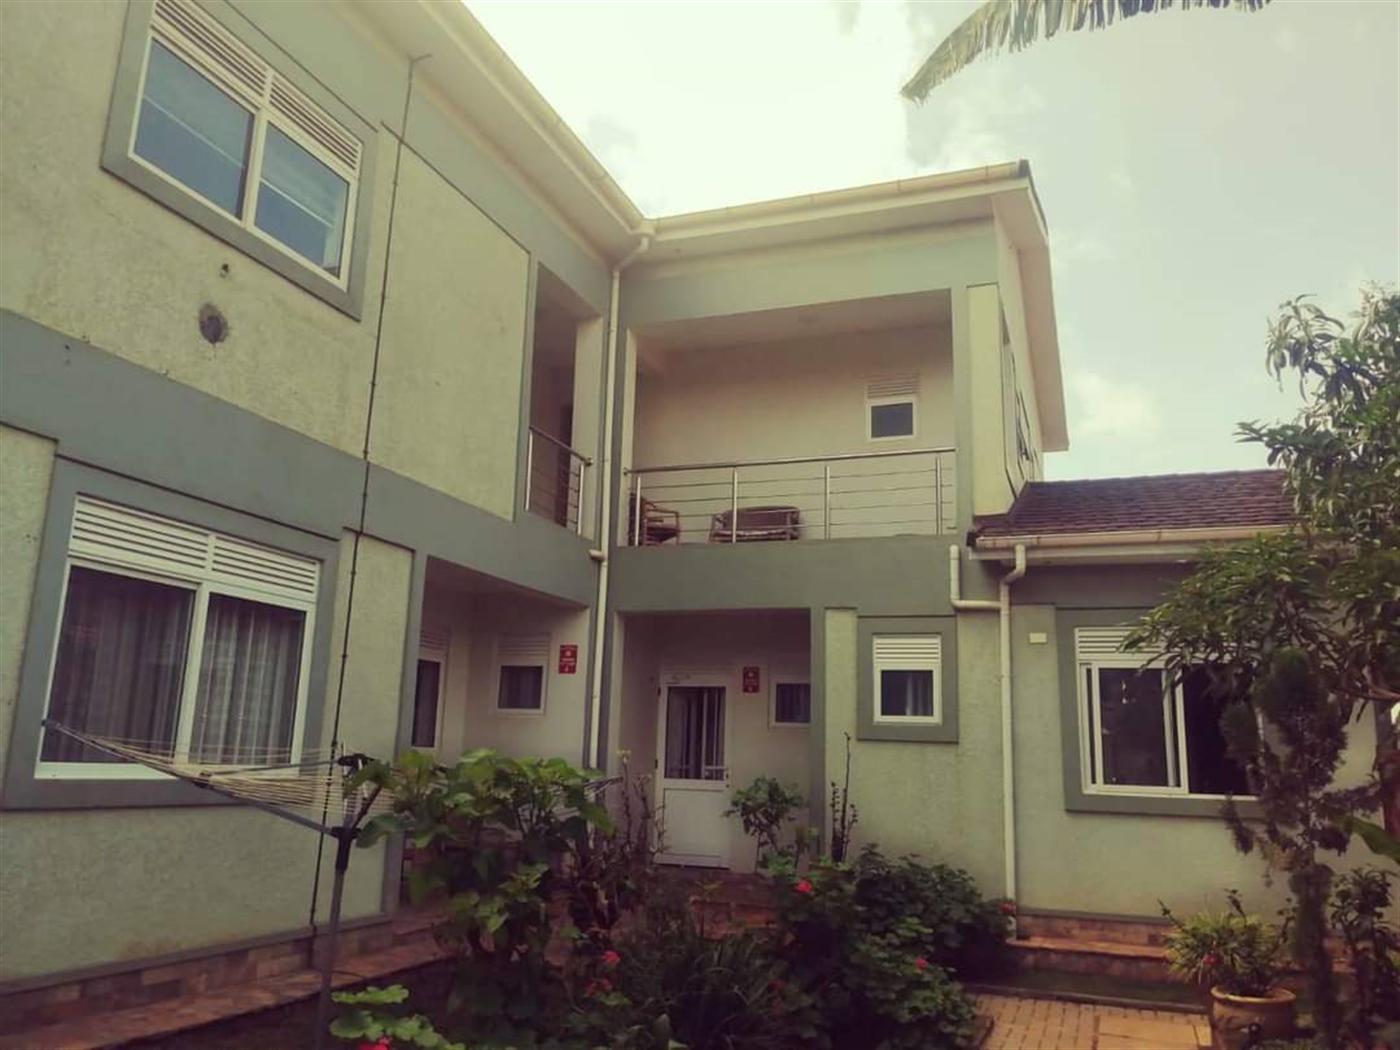 Penthouse for rent in Muyenga Kampala